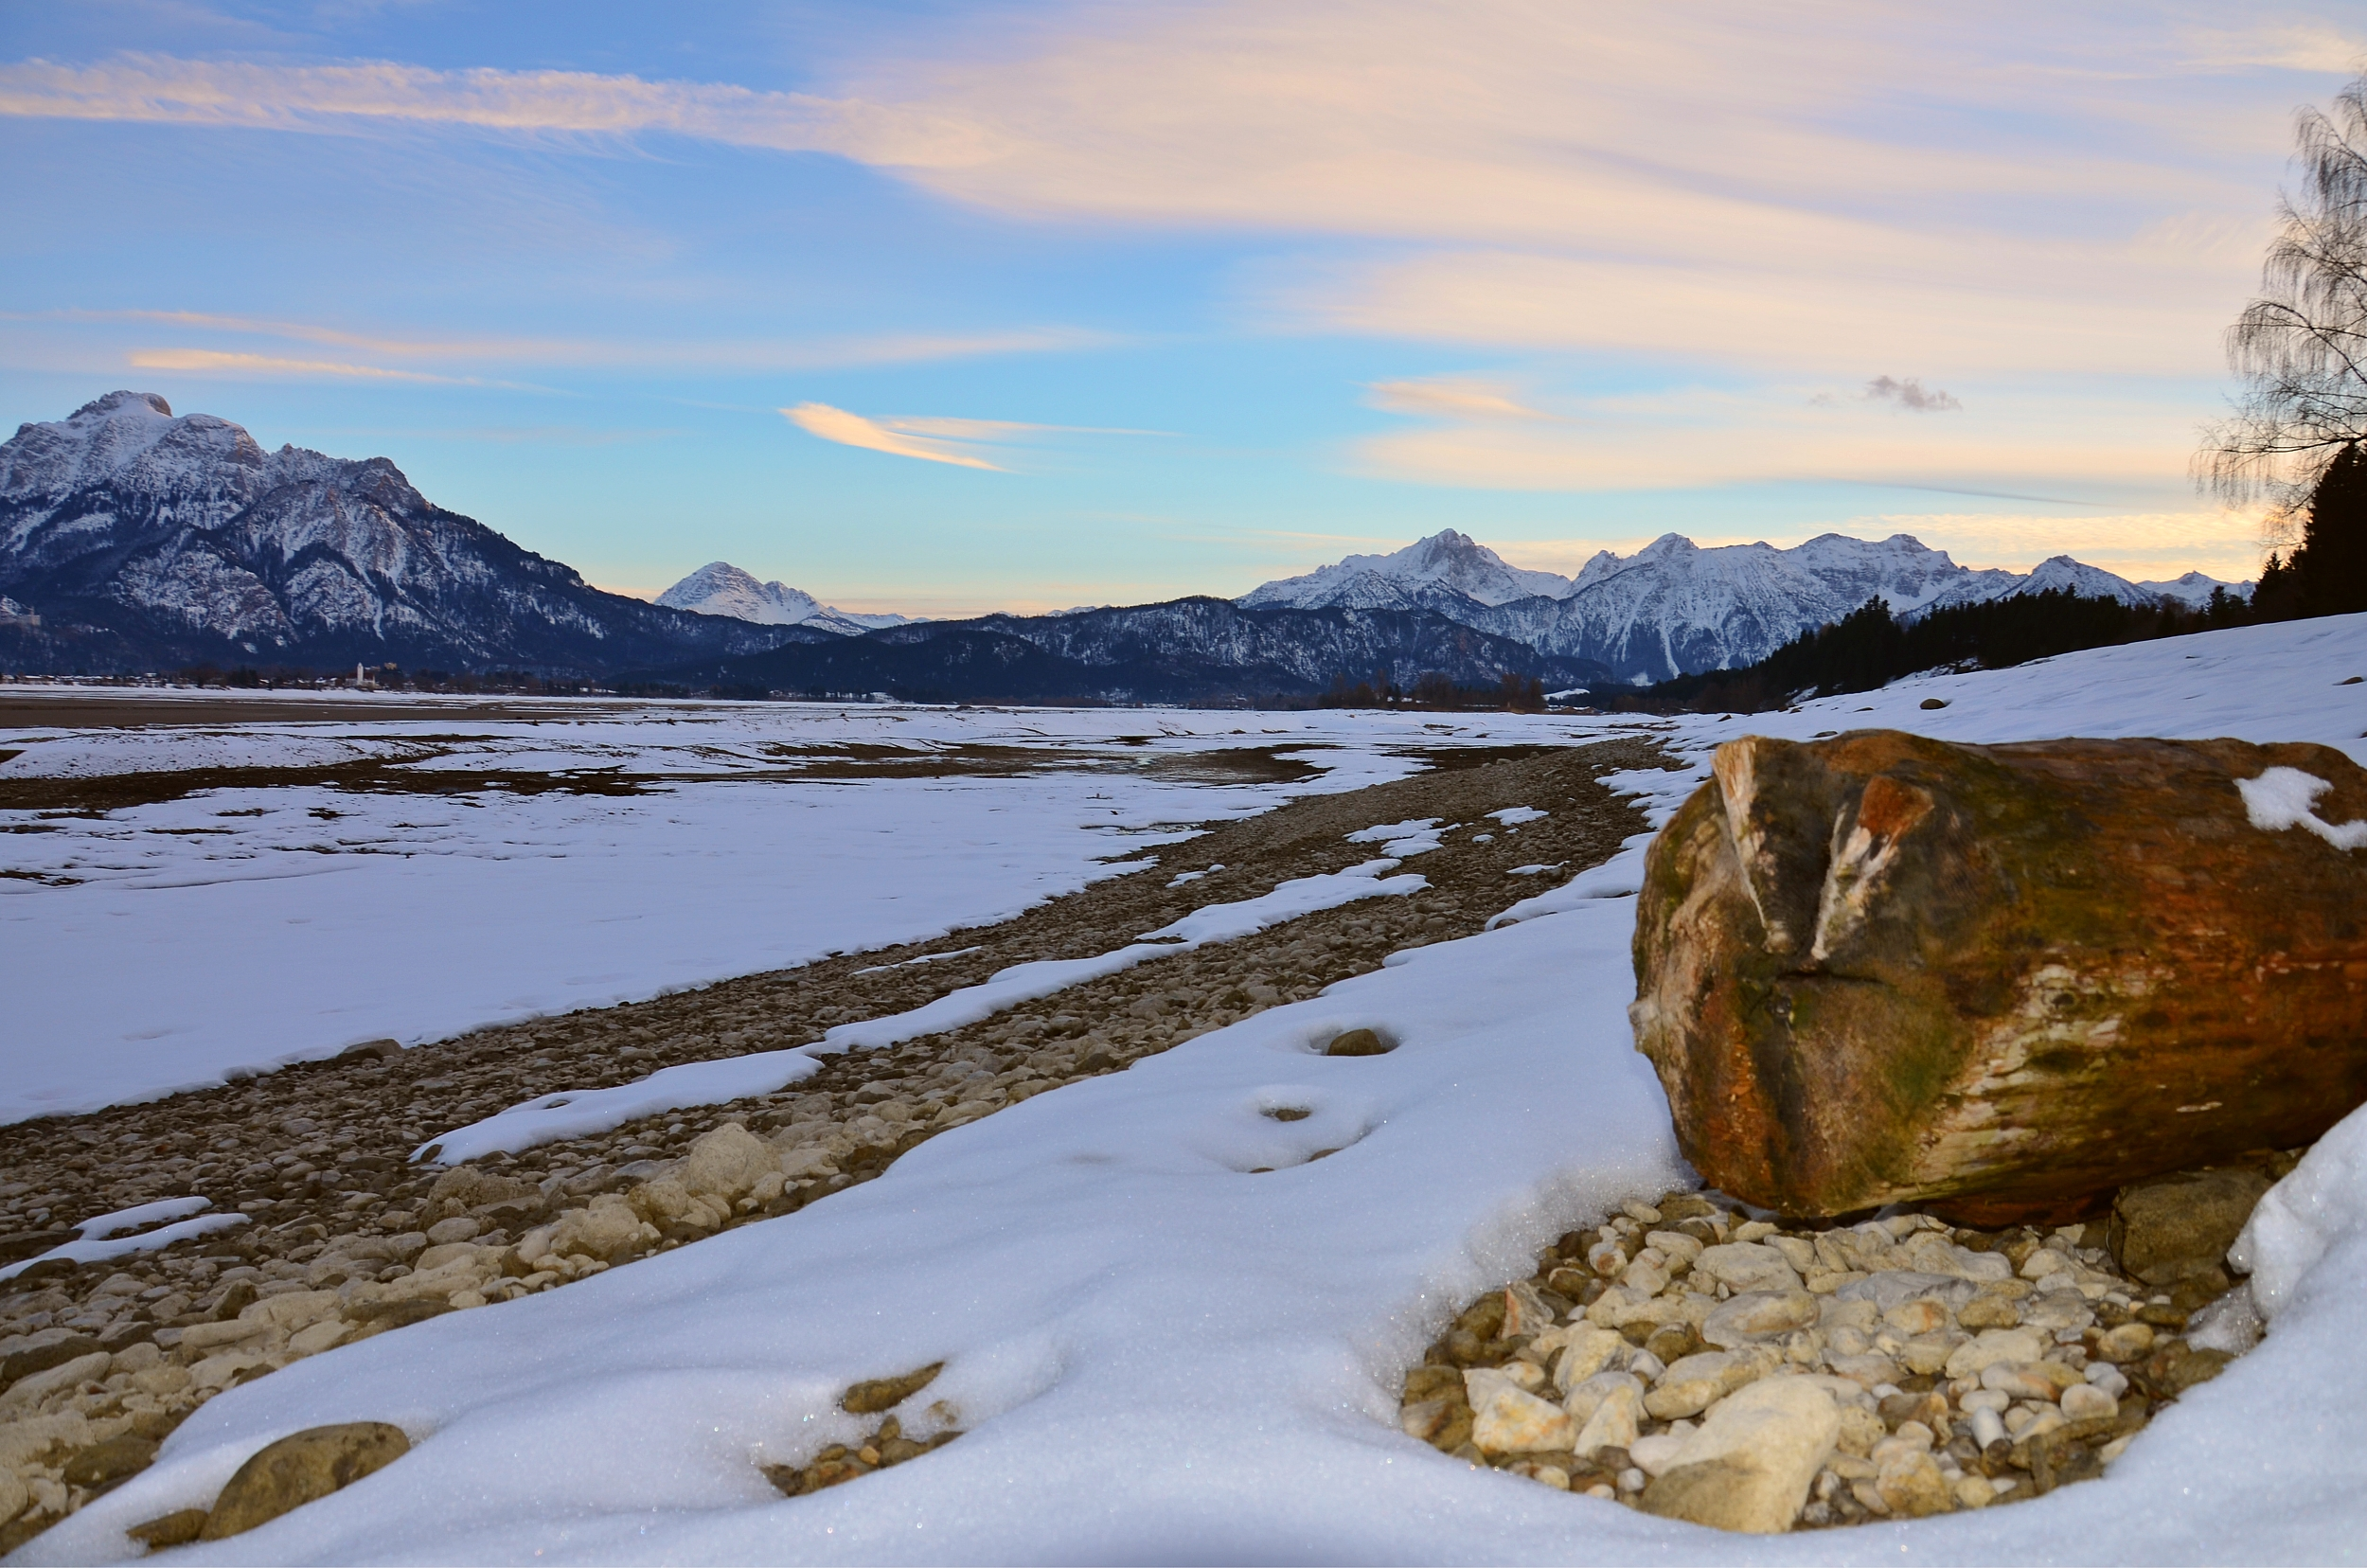 G0123 Abendrot Forggensee letzter Schnee.jpg